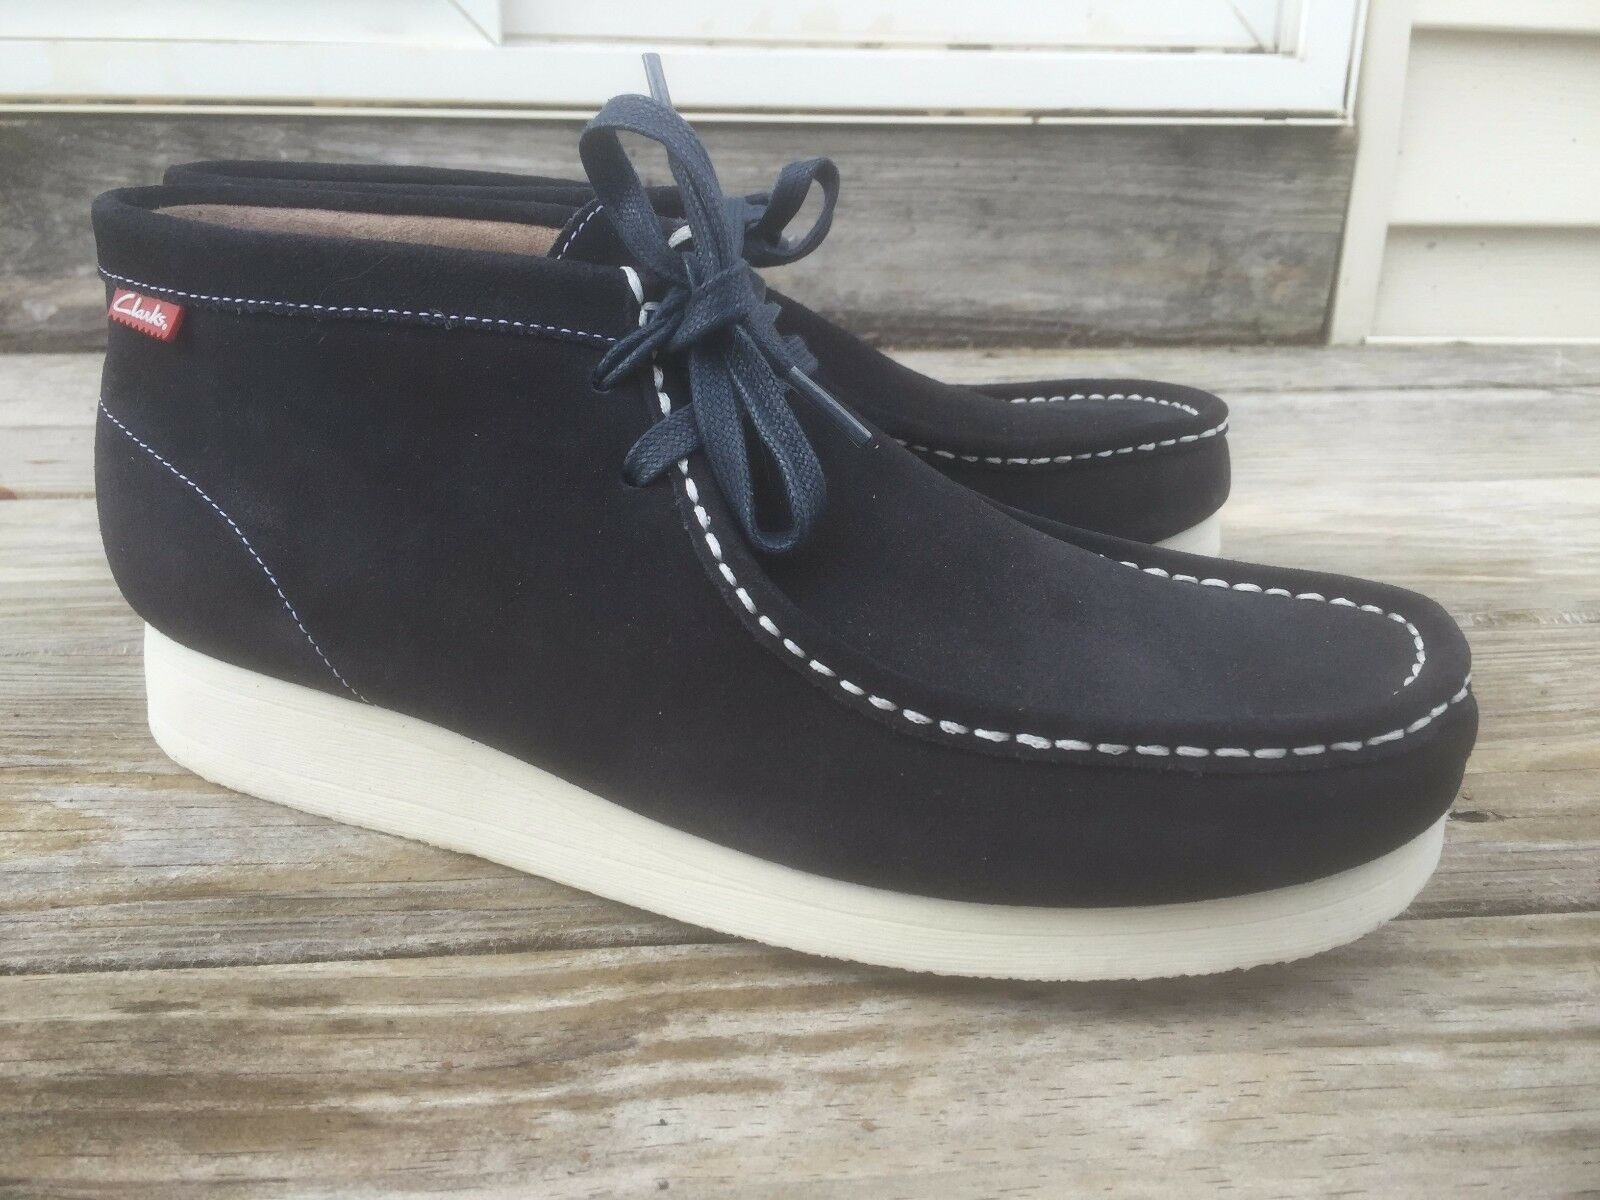 Brand New Clarks Originals Padmore II Stinson Navy shoes Boots Men 65921 SZ 10.5M